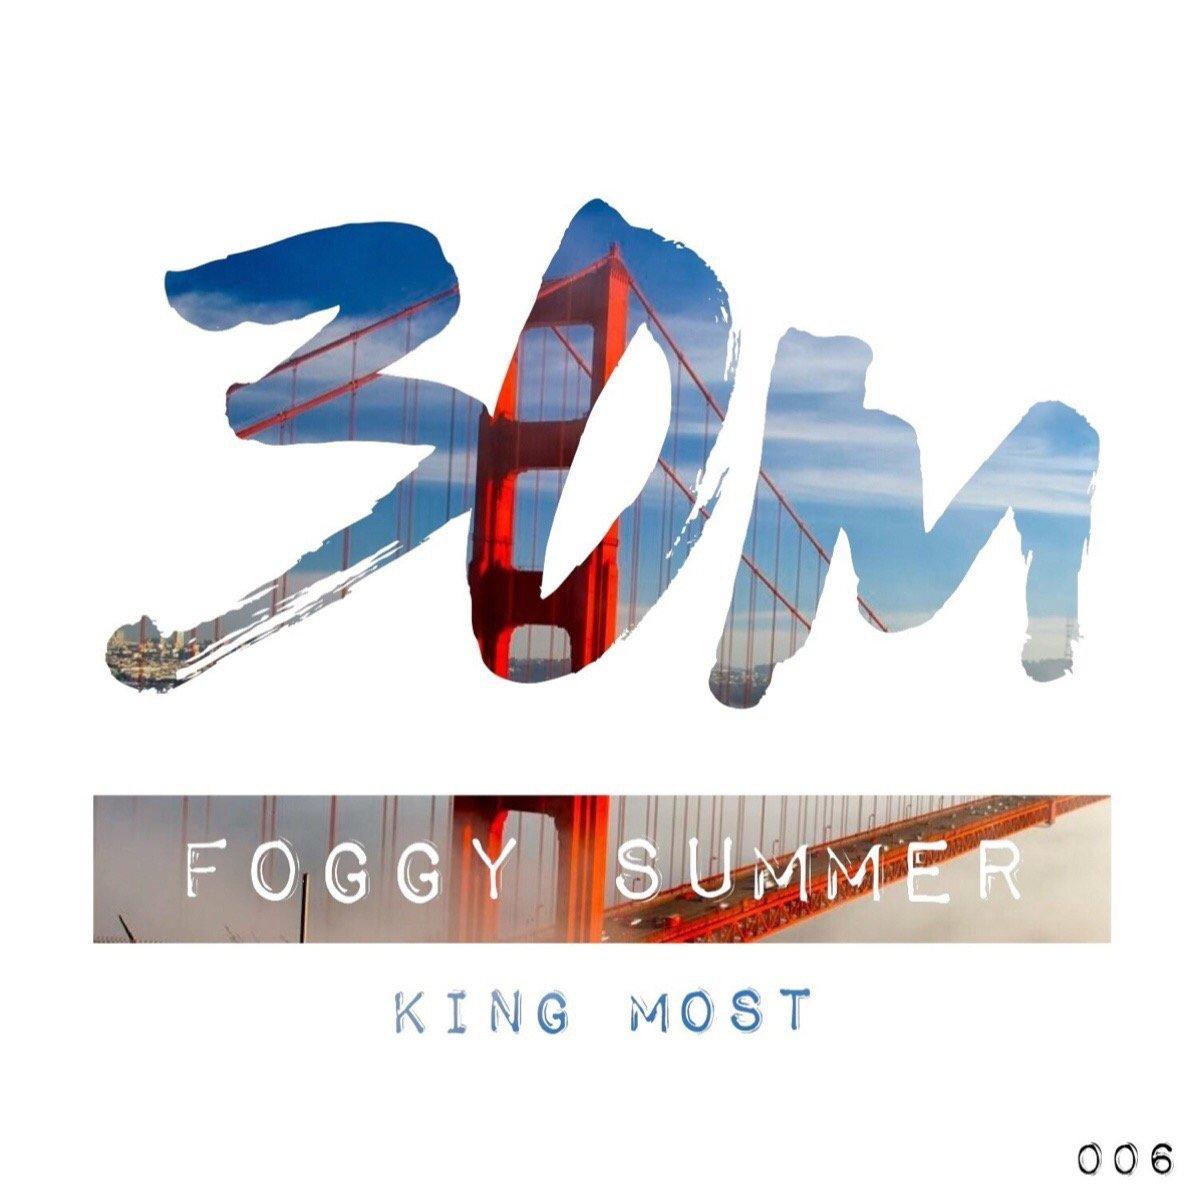 006: Foggy Summer - King Most (San Francisco)